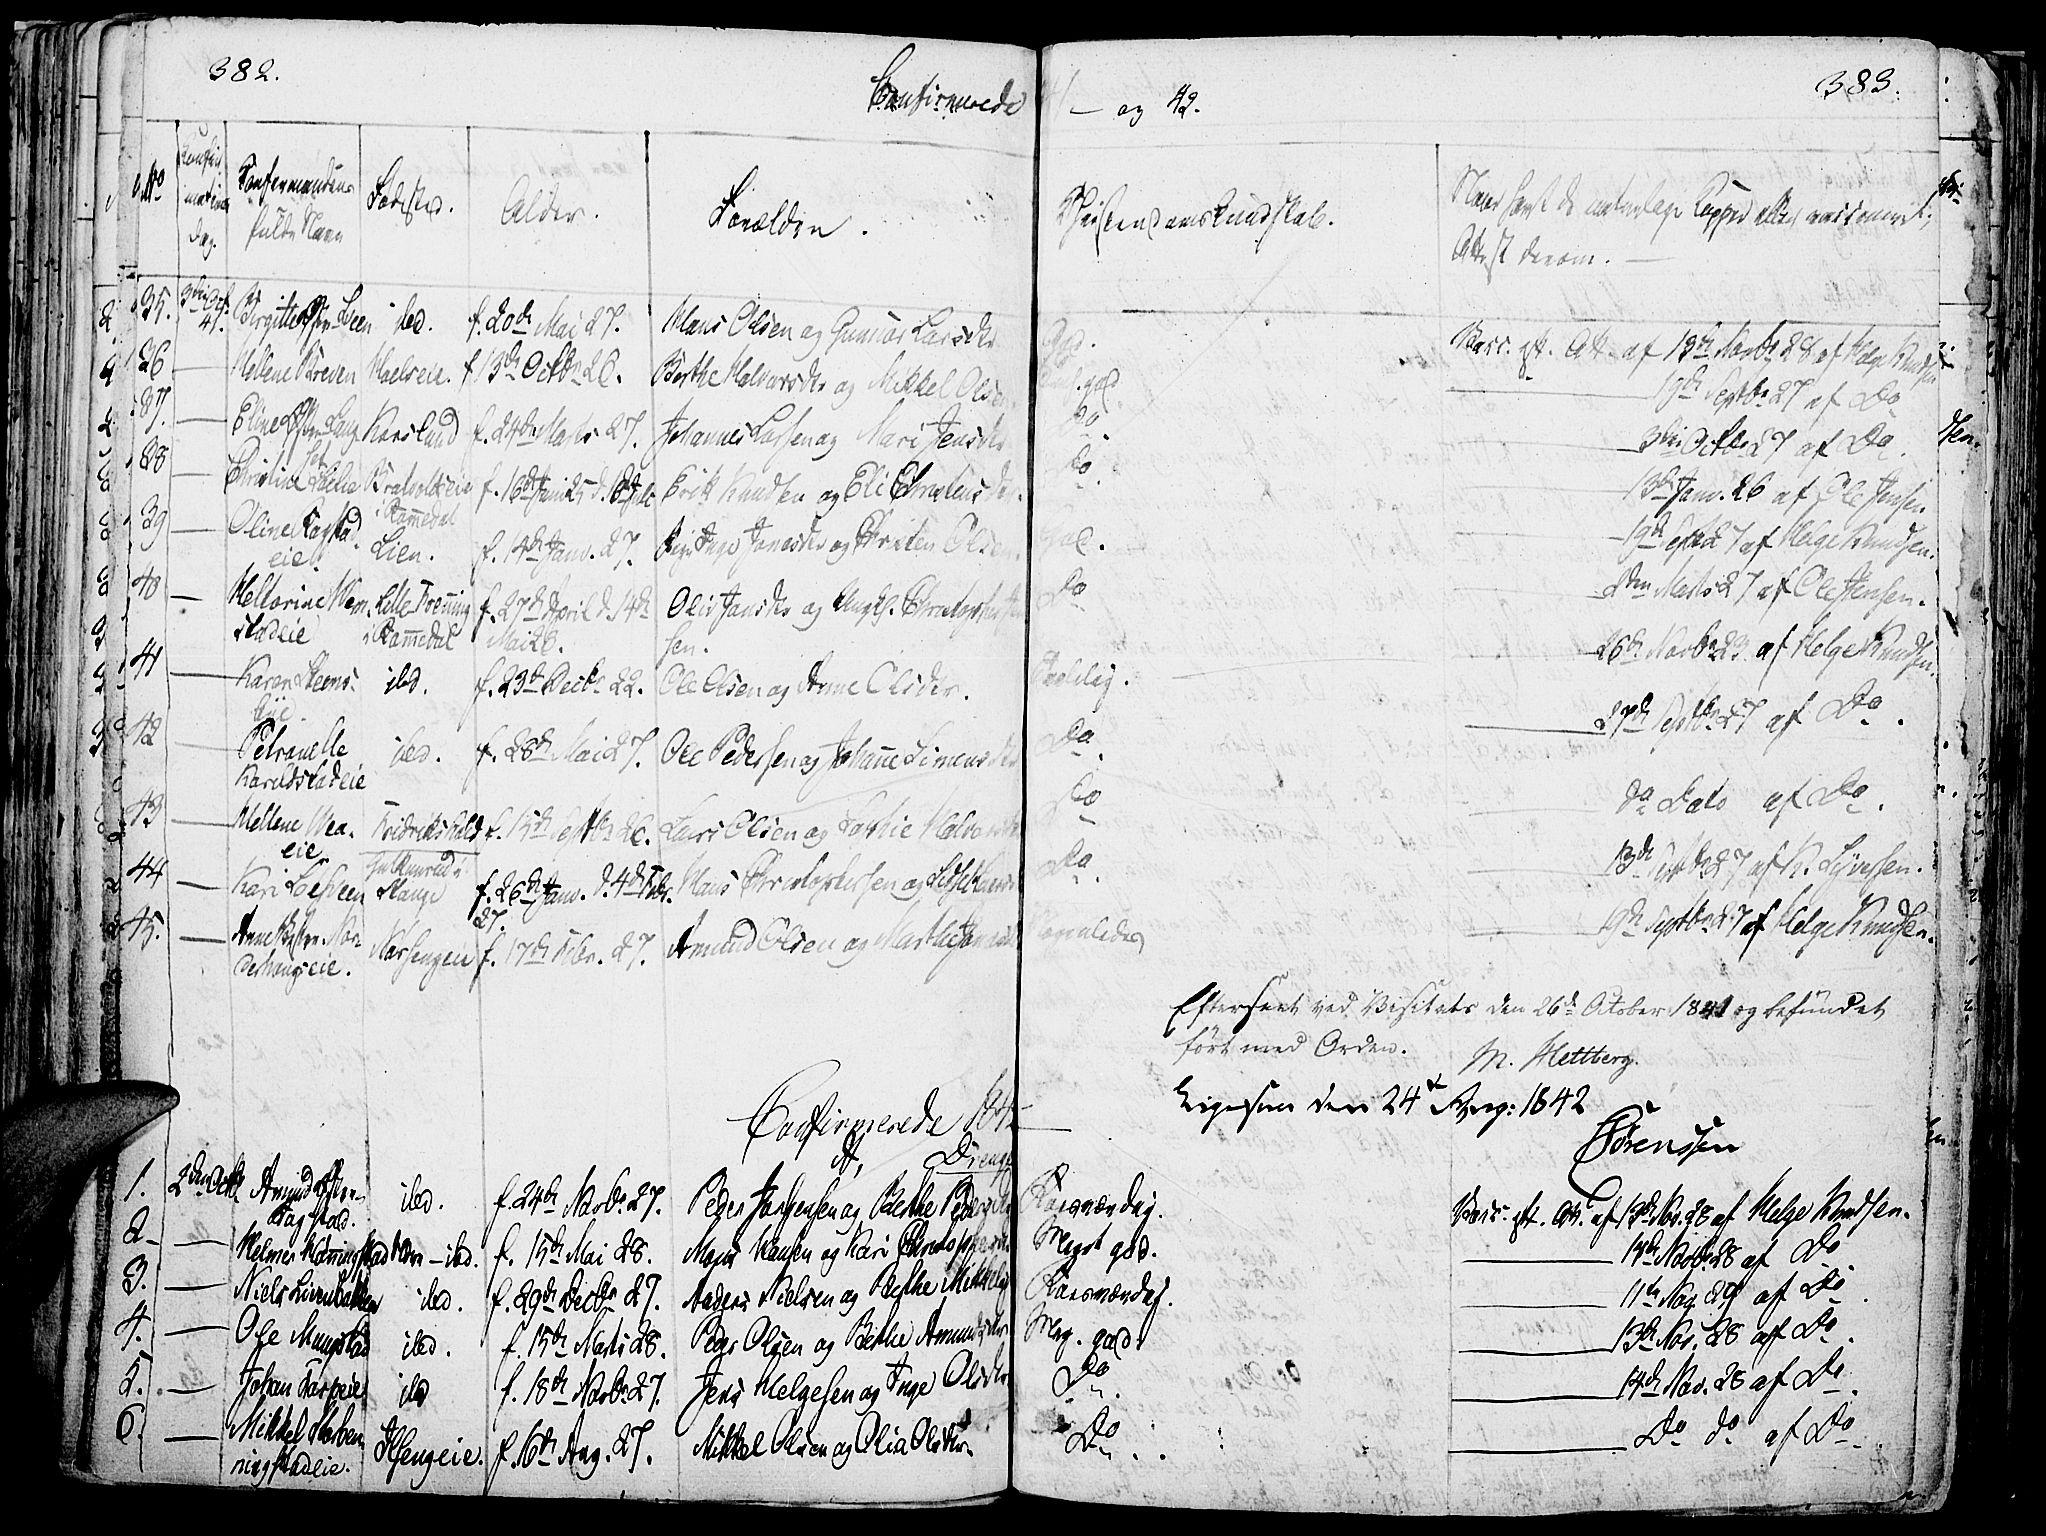 SAH, Løten prestekontor, K/Ka/L0006: Ministerialbok nr. 6, 1832-1849, s. 382-383